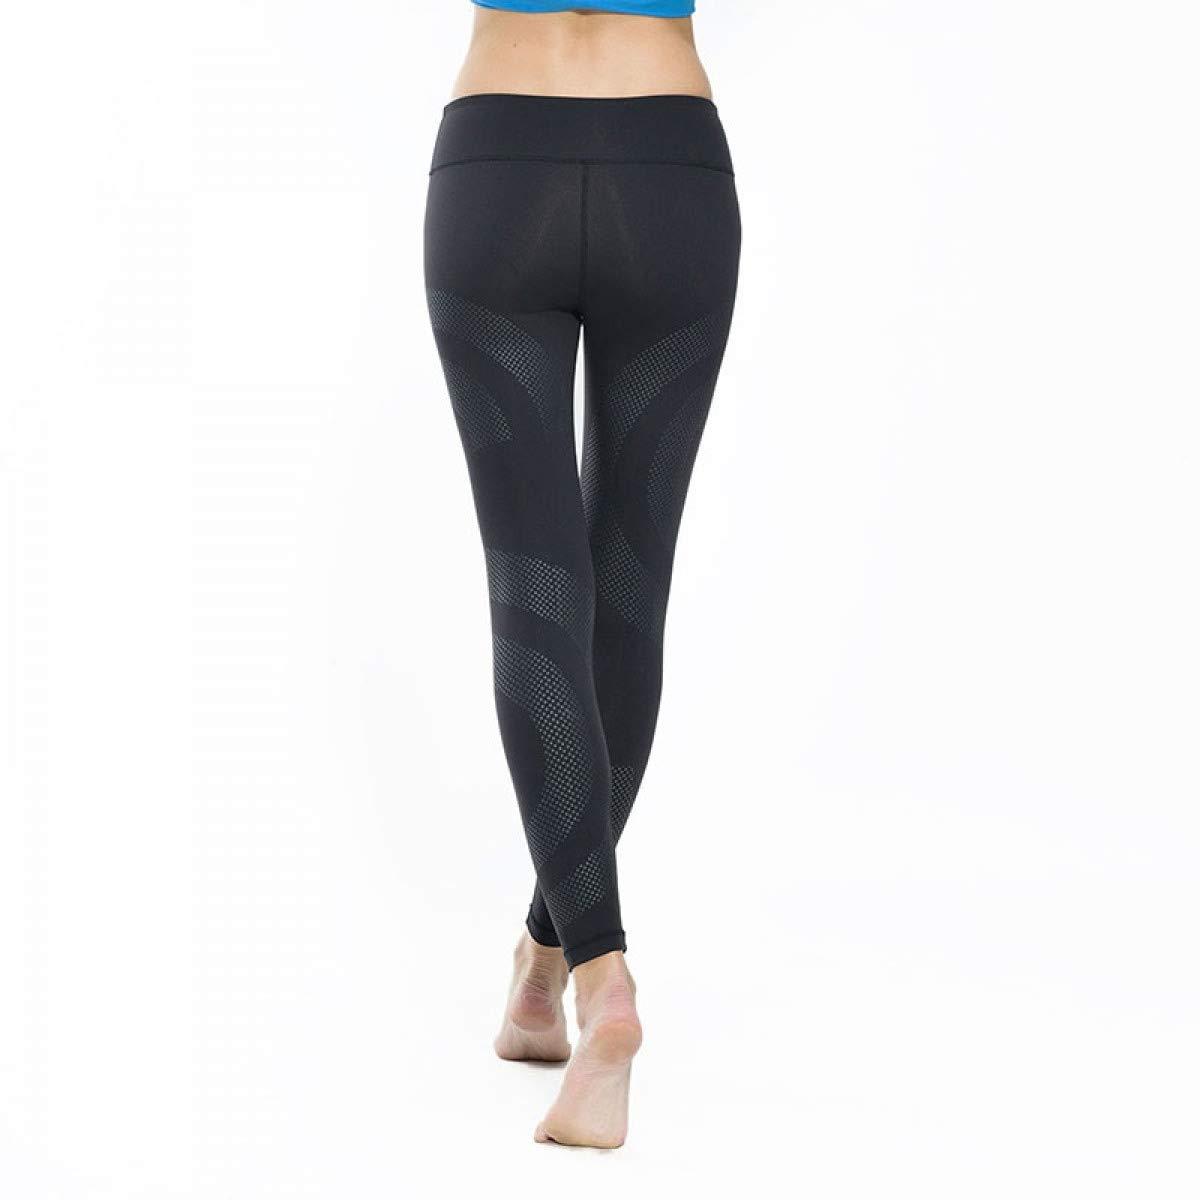 147b0e34624fa Amazon.com: MIKI SHOP Leggings for Women Pants Women's Sports Tights ...